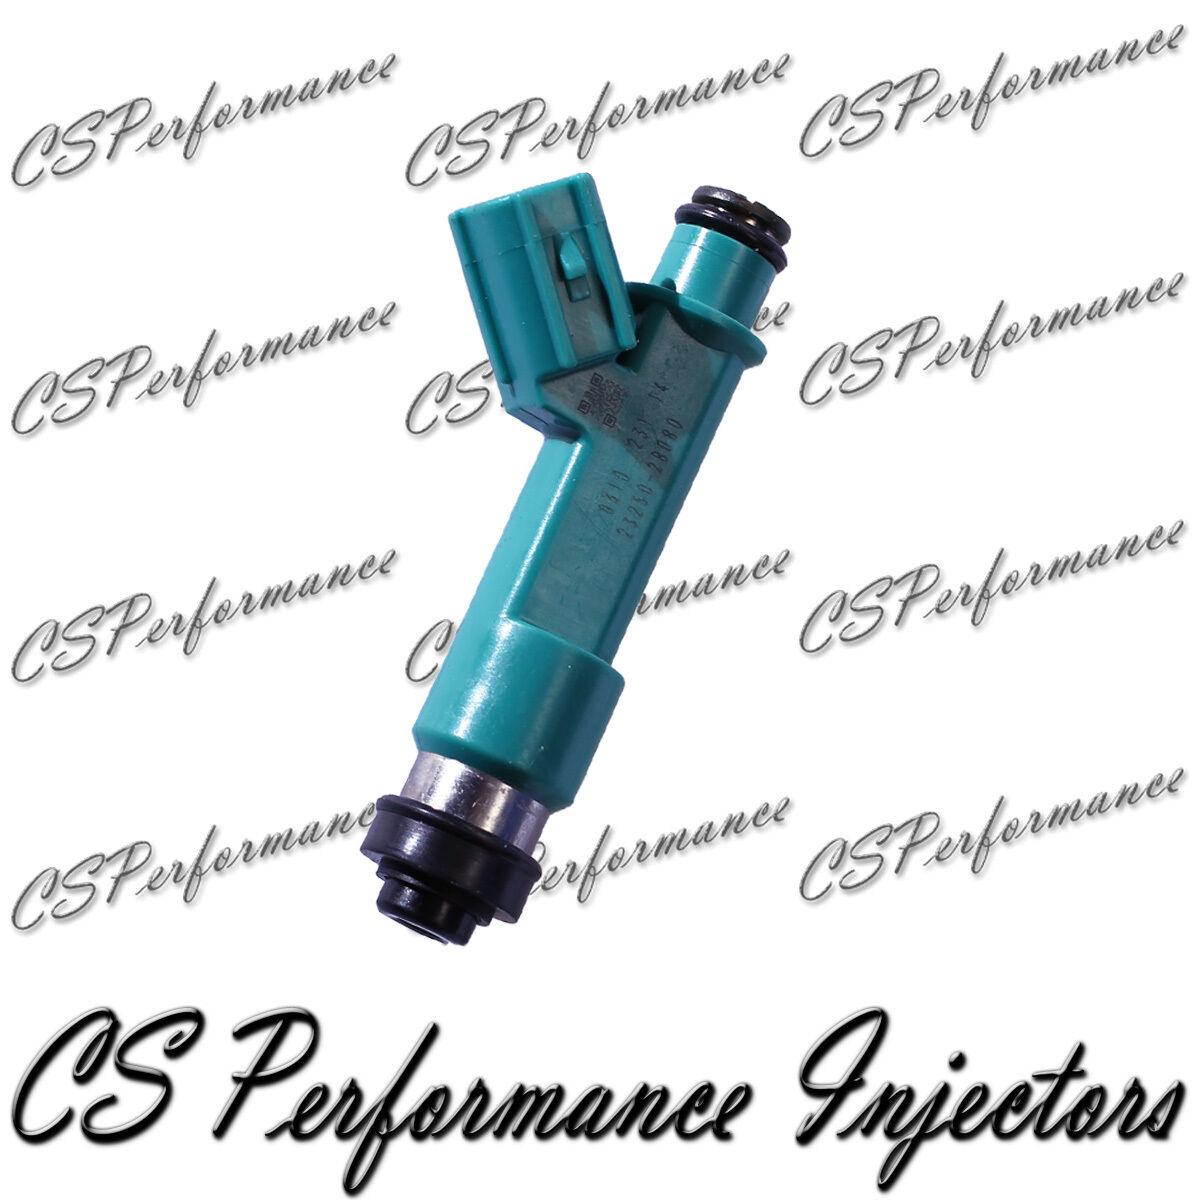 OEM Denso Fuel Injectors Set 4 23250-28080 Rebuilt by Master ASE Mechanic USA